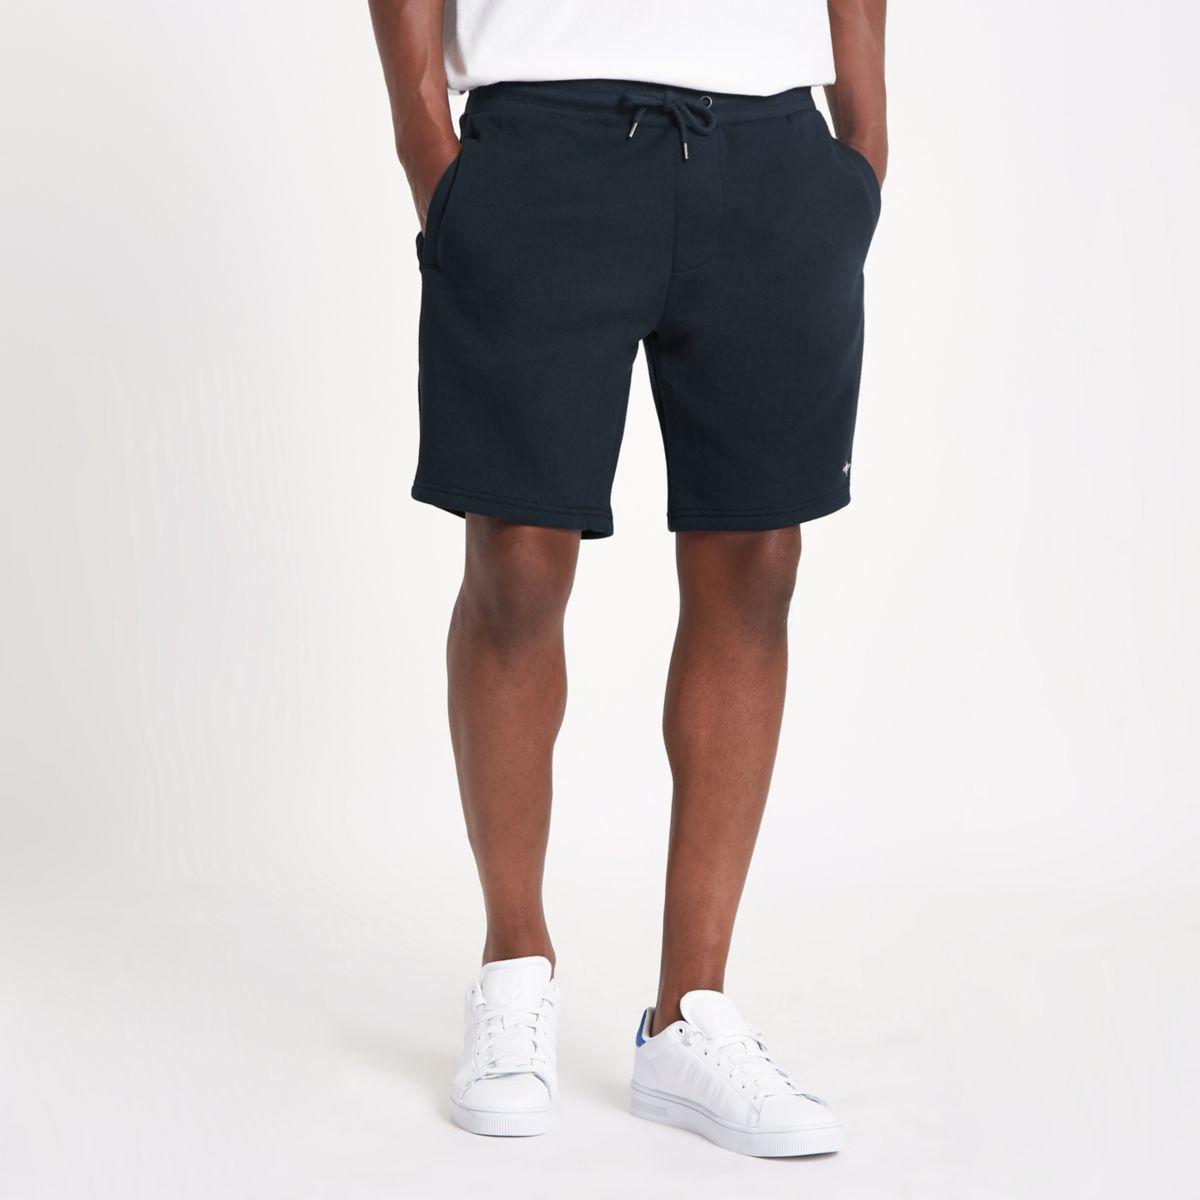 Navy tape side slim fit shorts